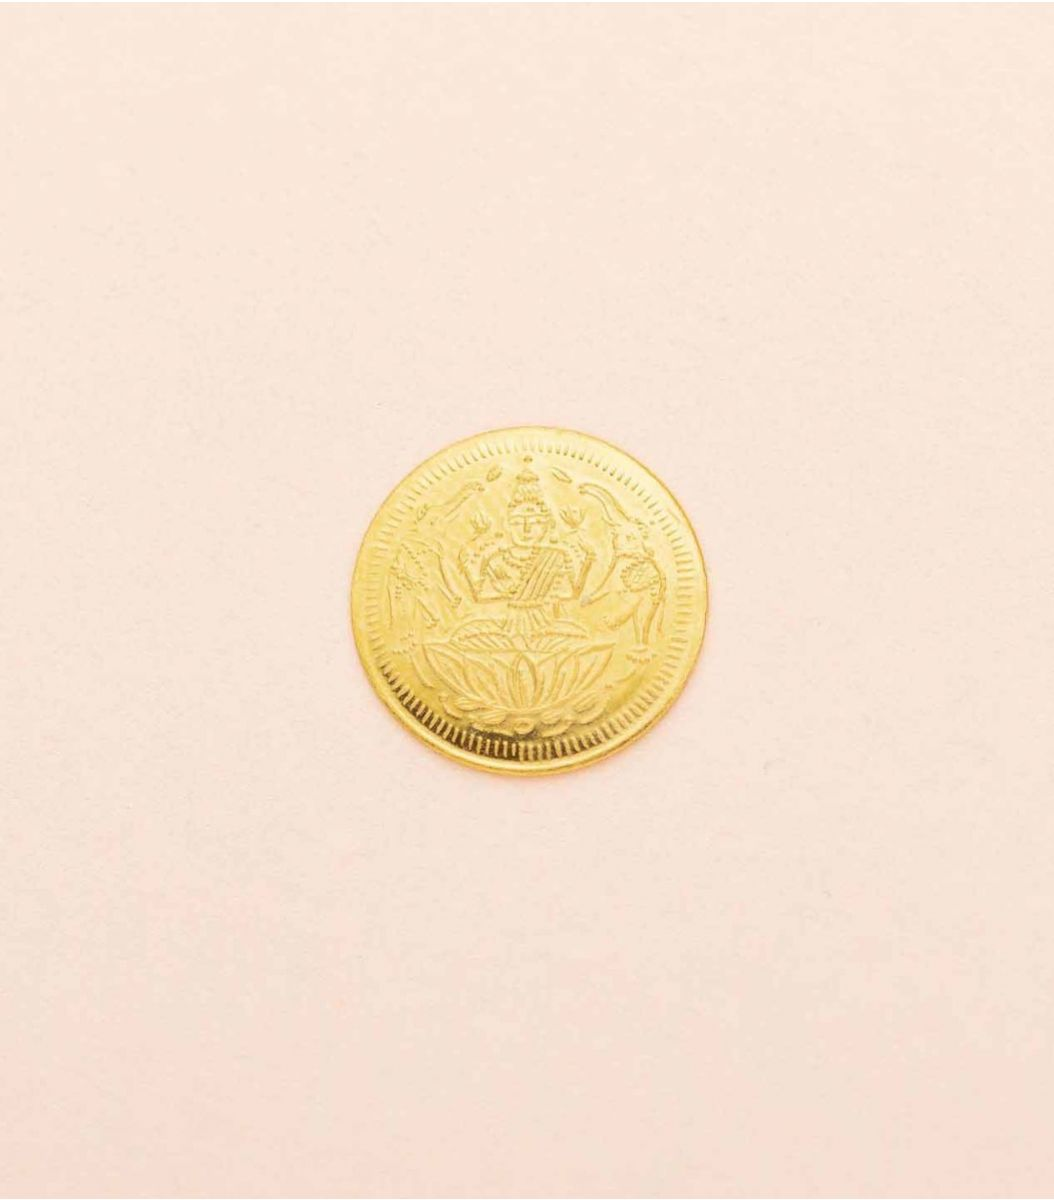 Gold Laxmi Coin-0.5GM